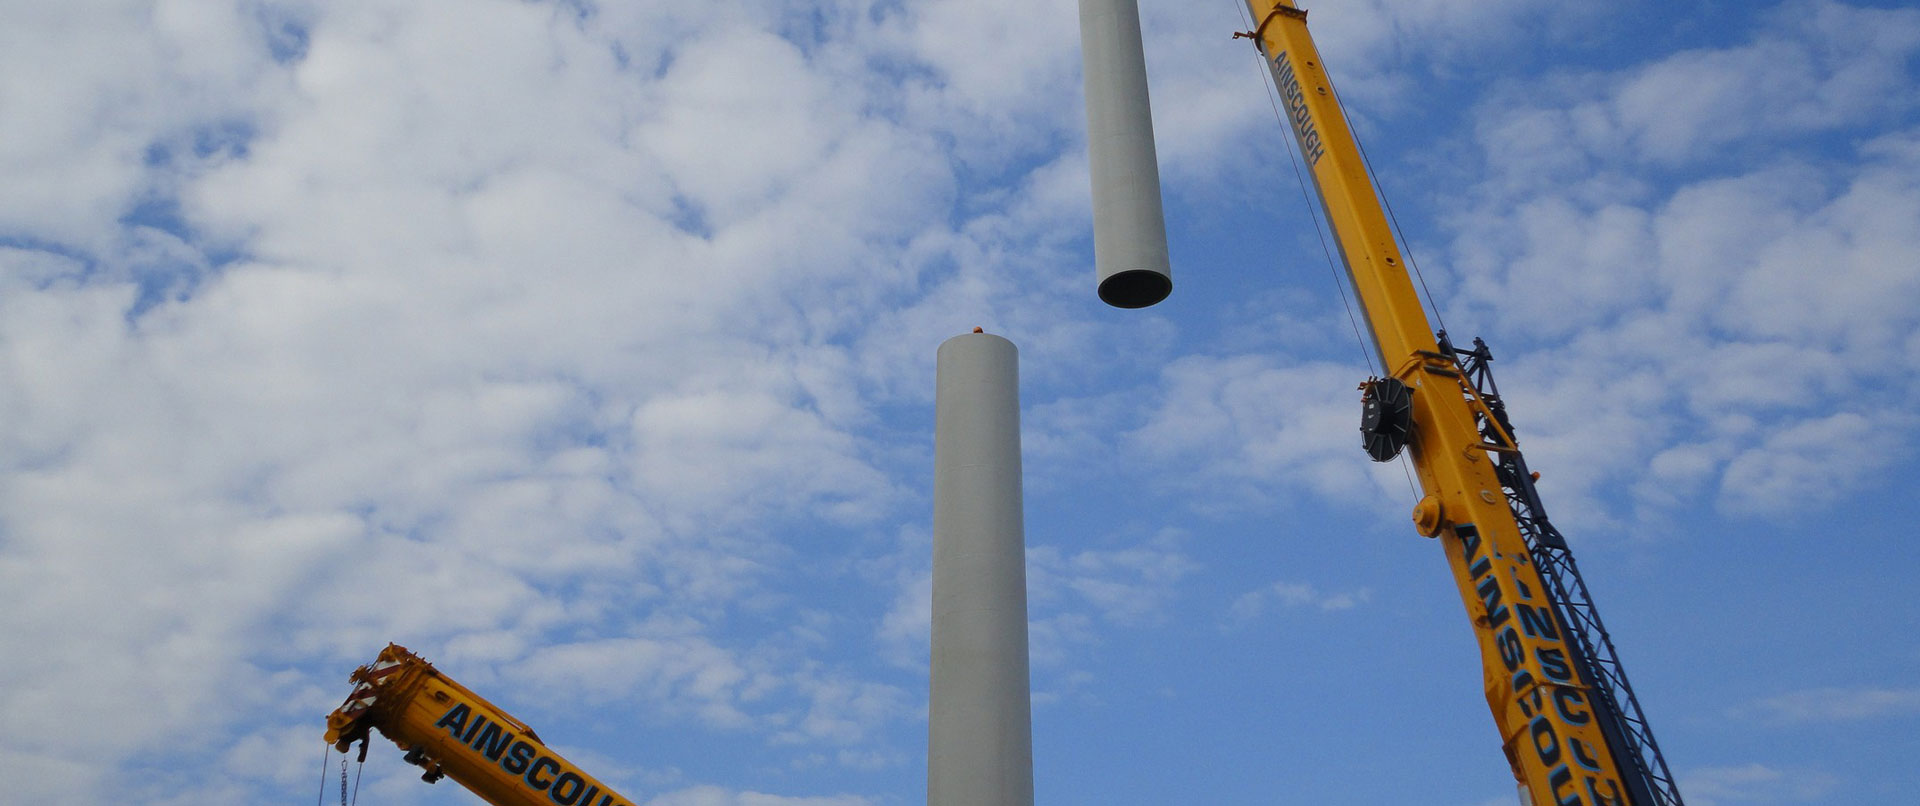 glaickfarm-windturbine-WES-5